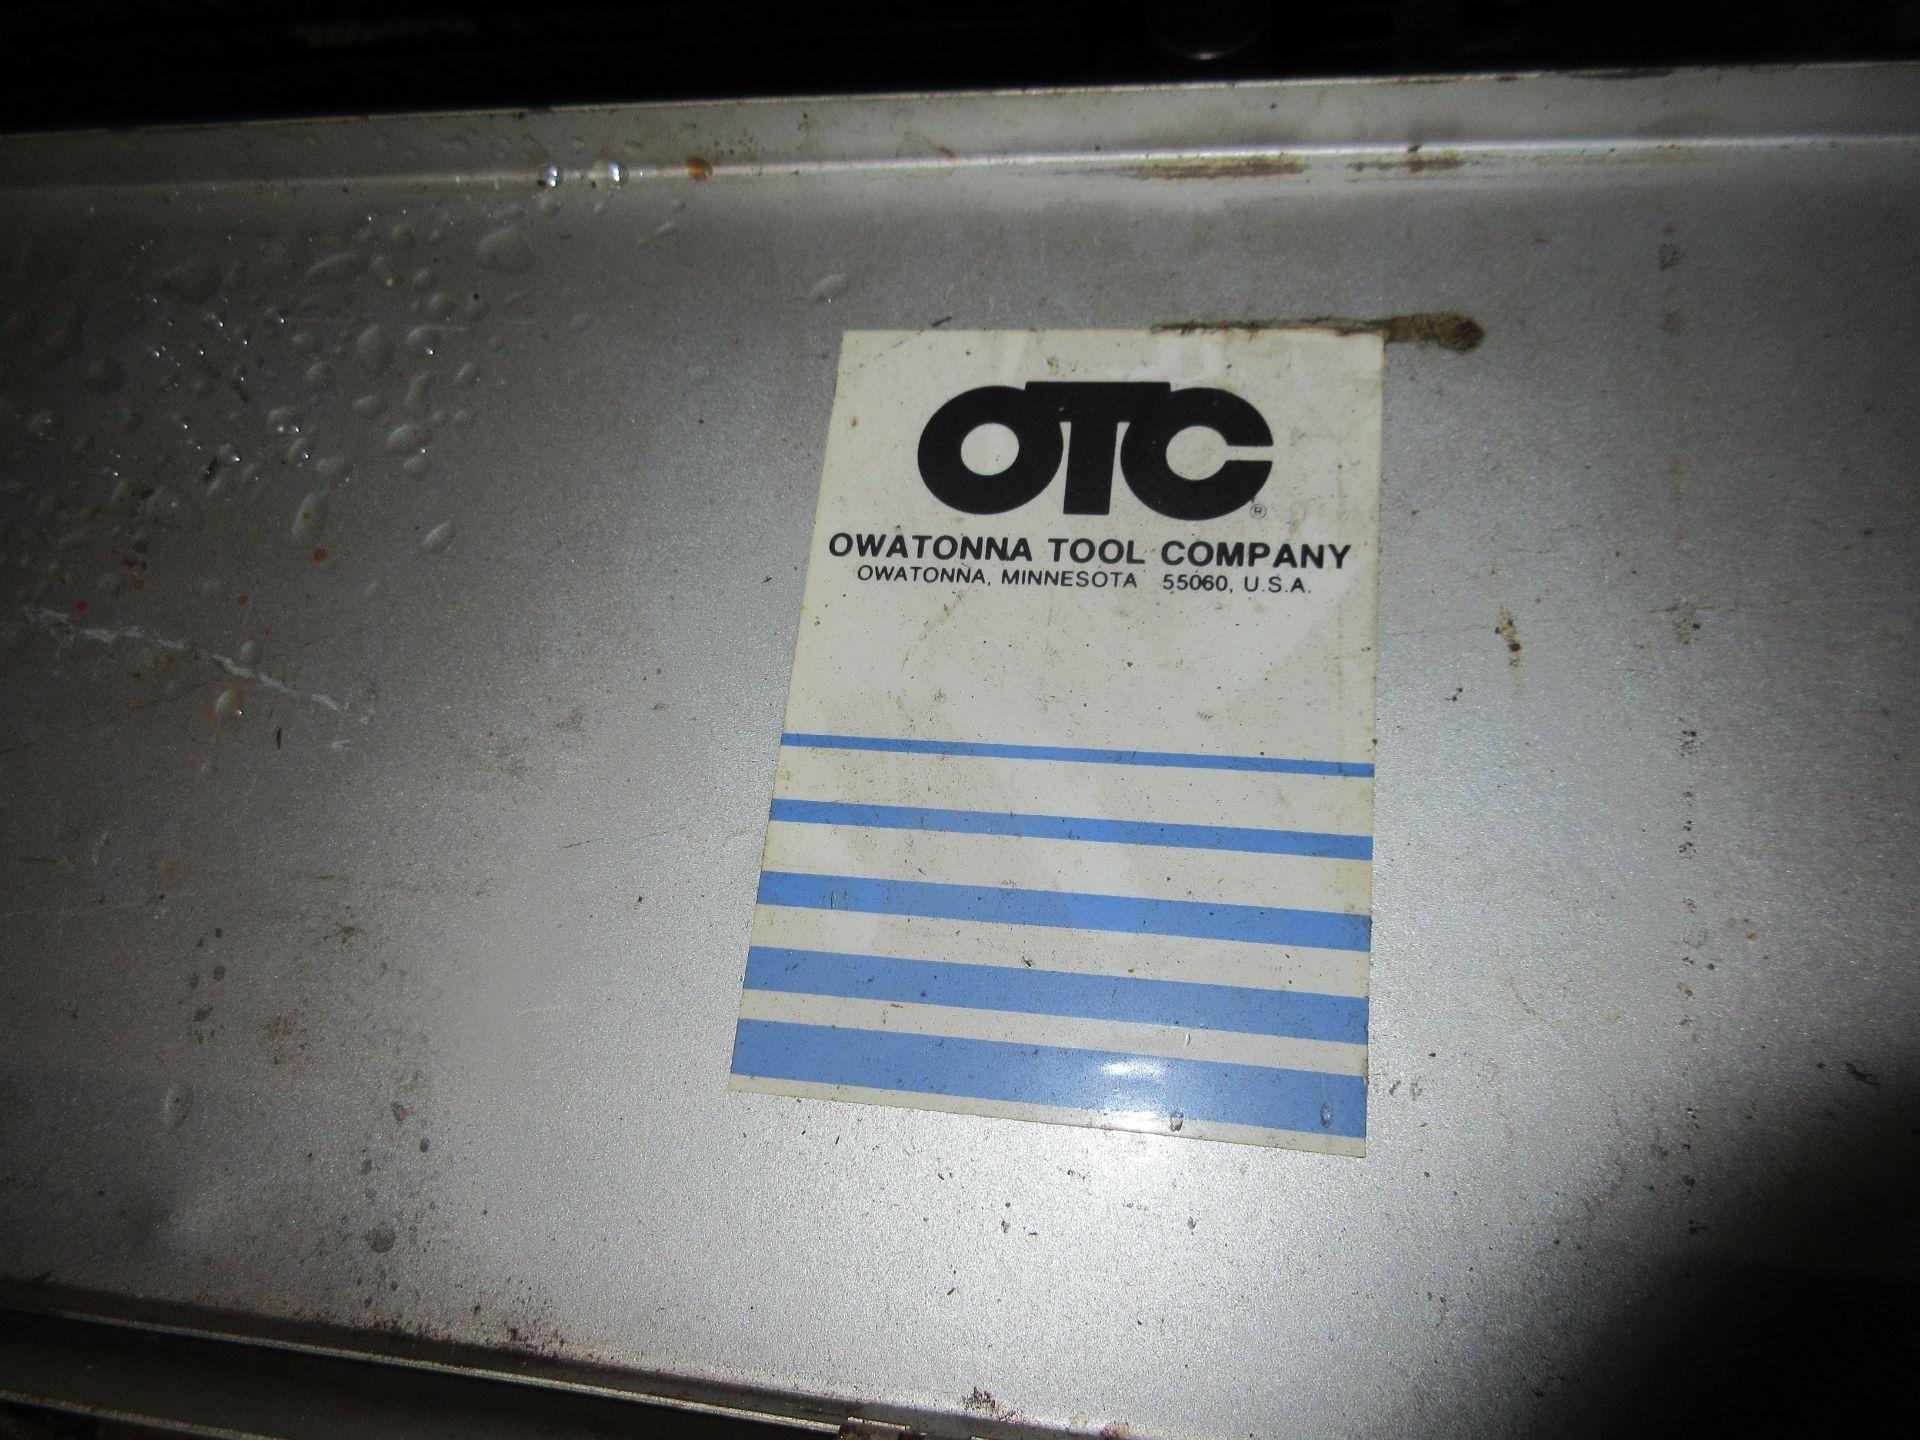 Owatonna (OTC) Hydraulic 10,000 PSI Hy. Torque Unit Model C S/N 53432 - Image 3 of 3